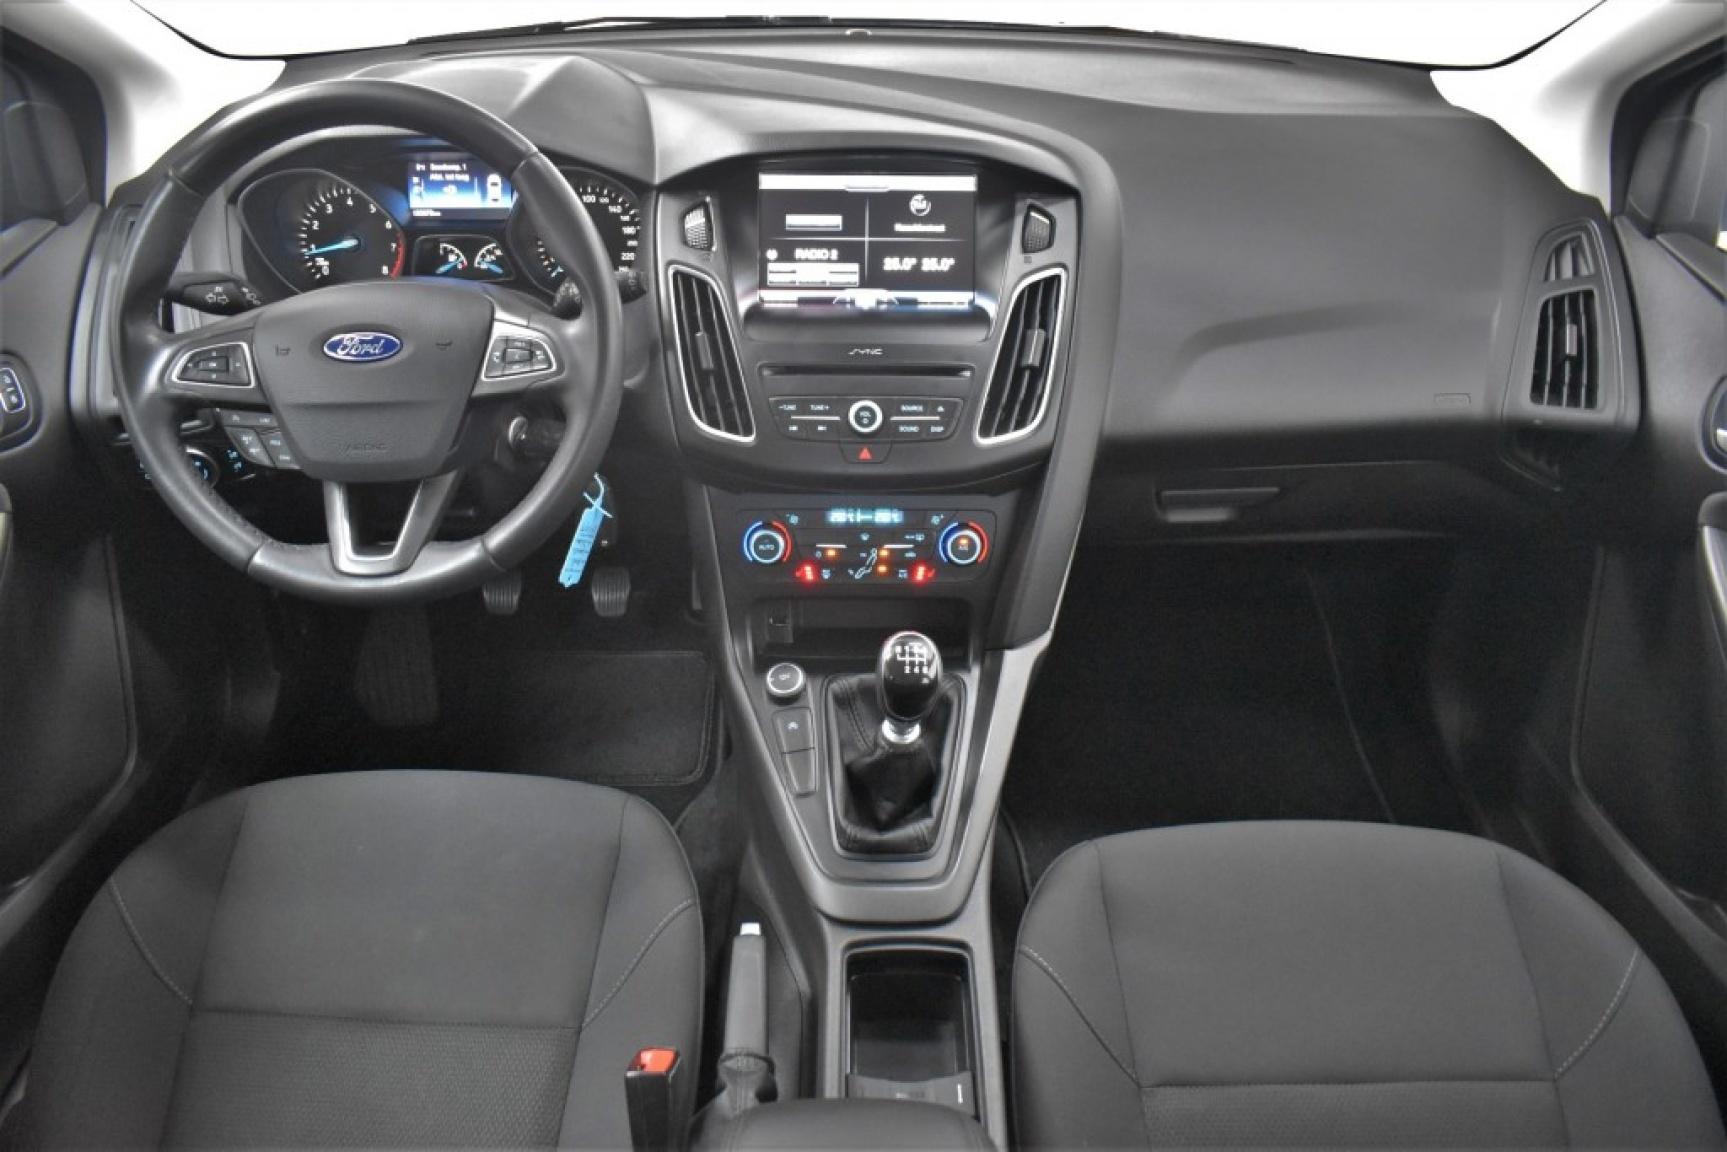 Ford-Focus-10